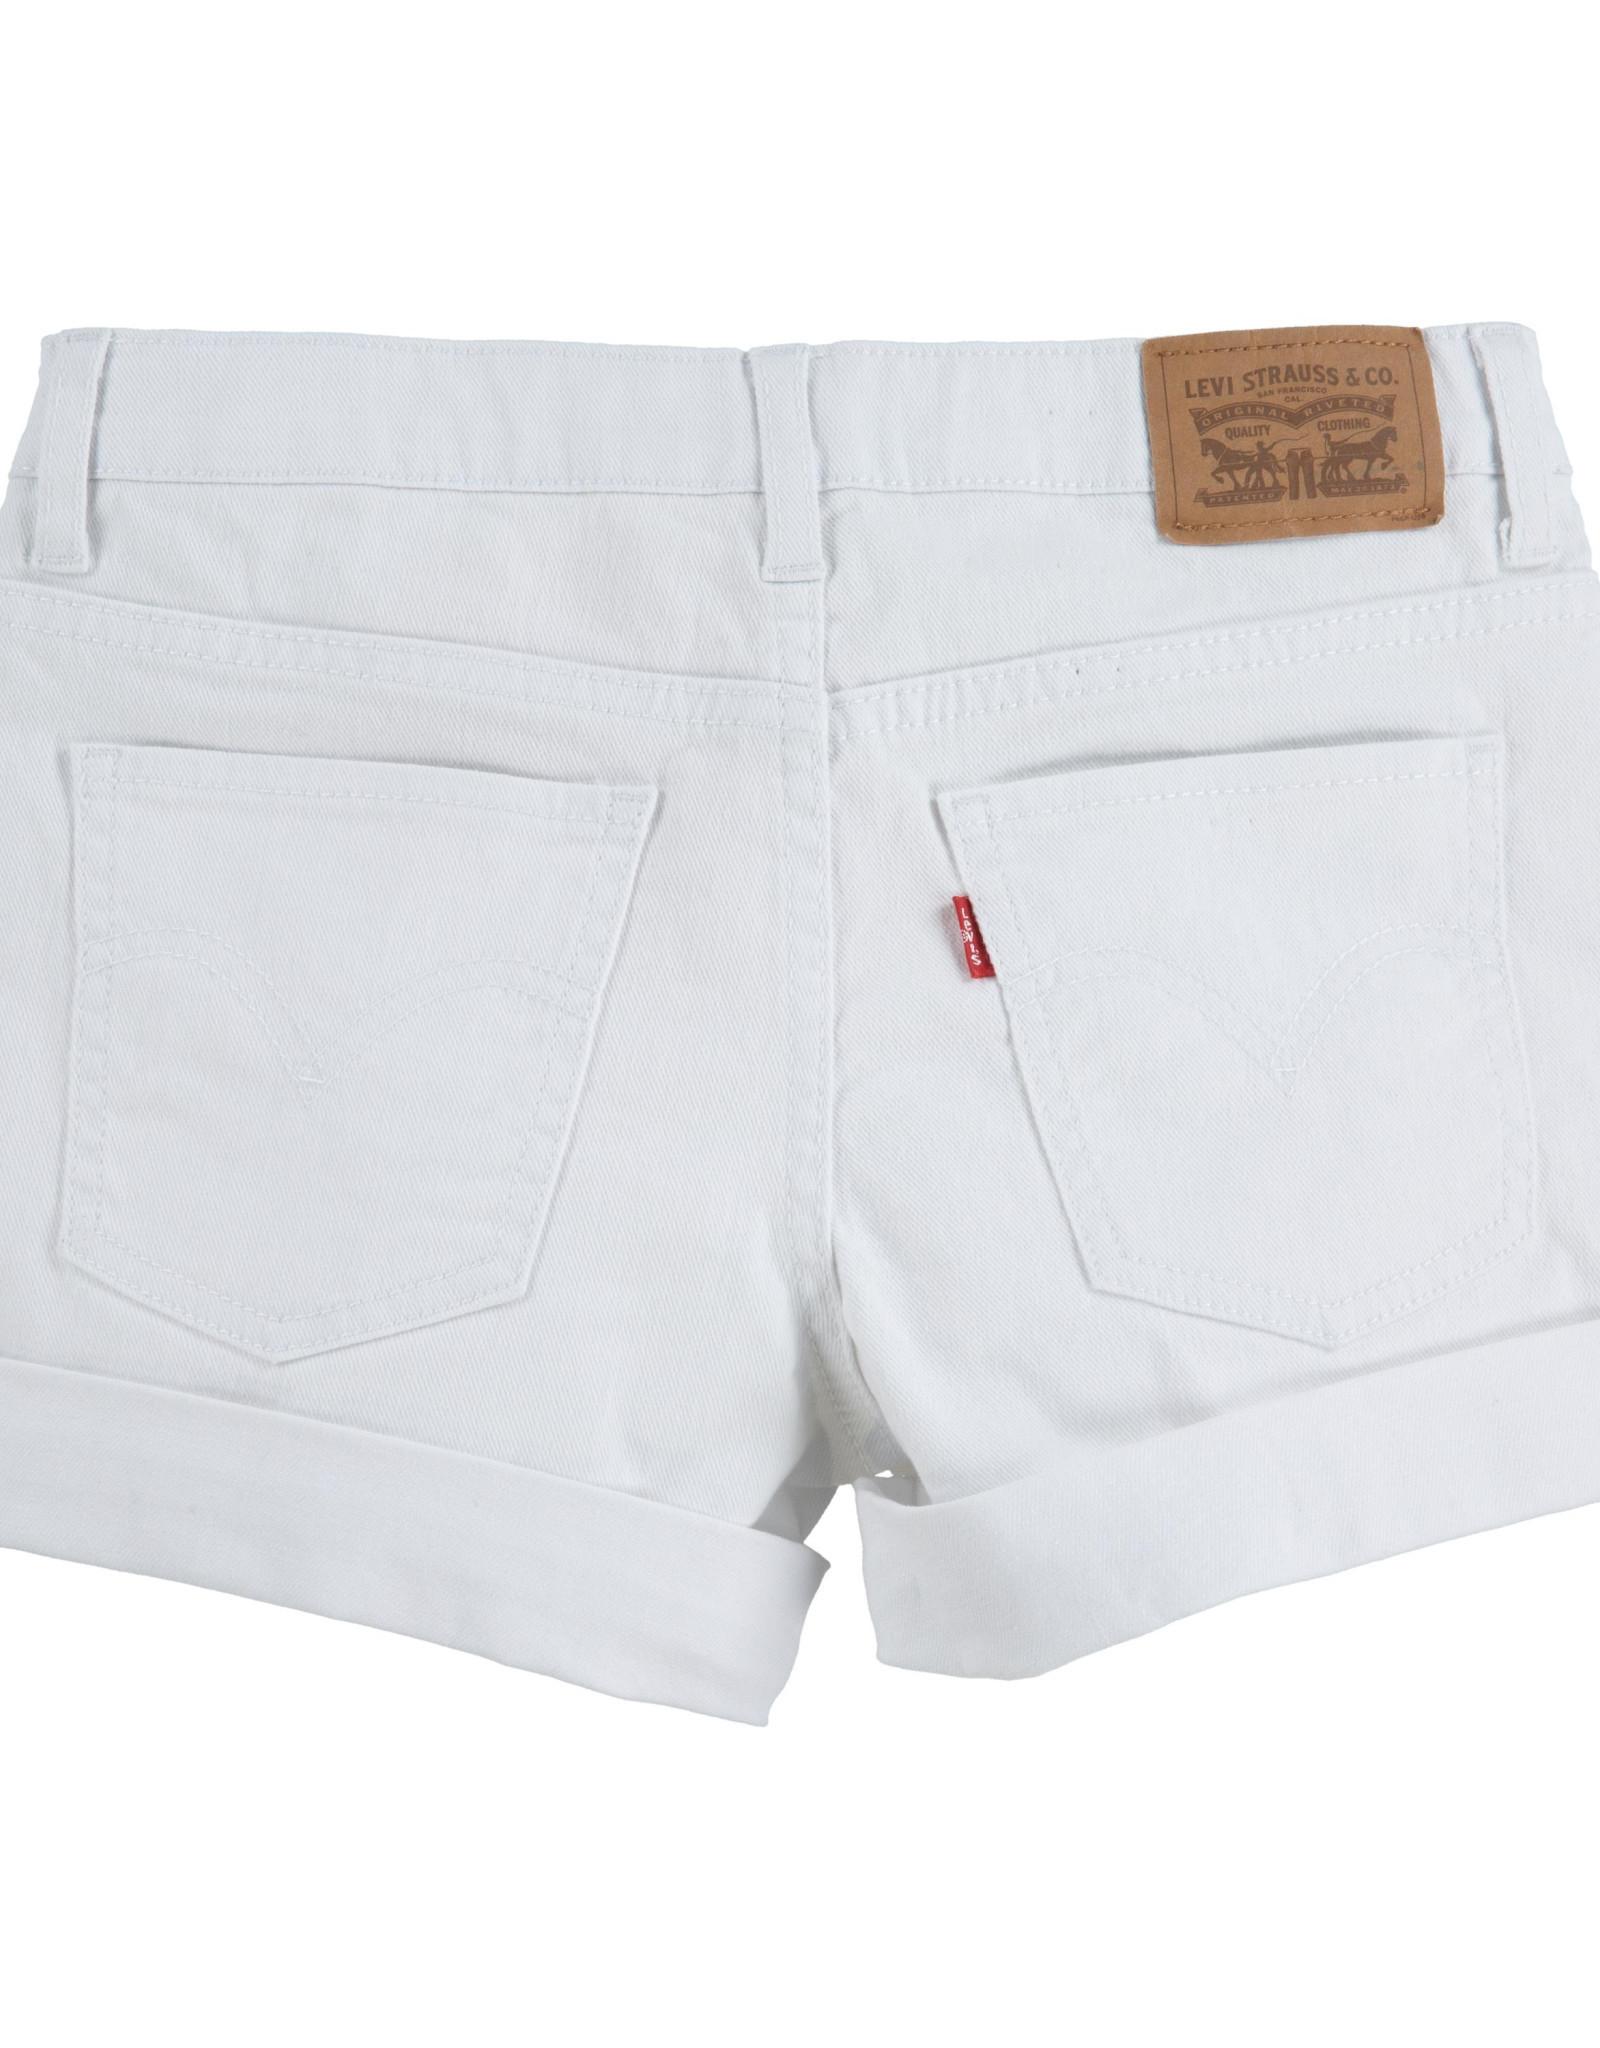 LEVI'S LEVI'S lvg girlfriend shorty short white